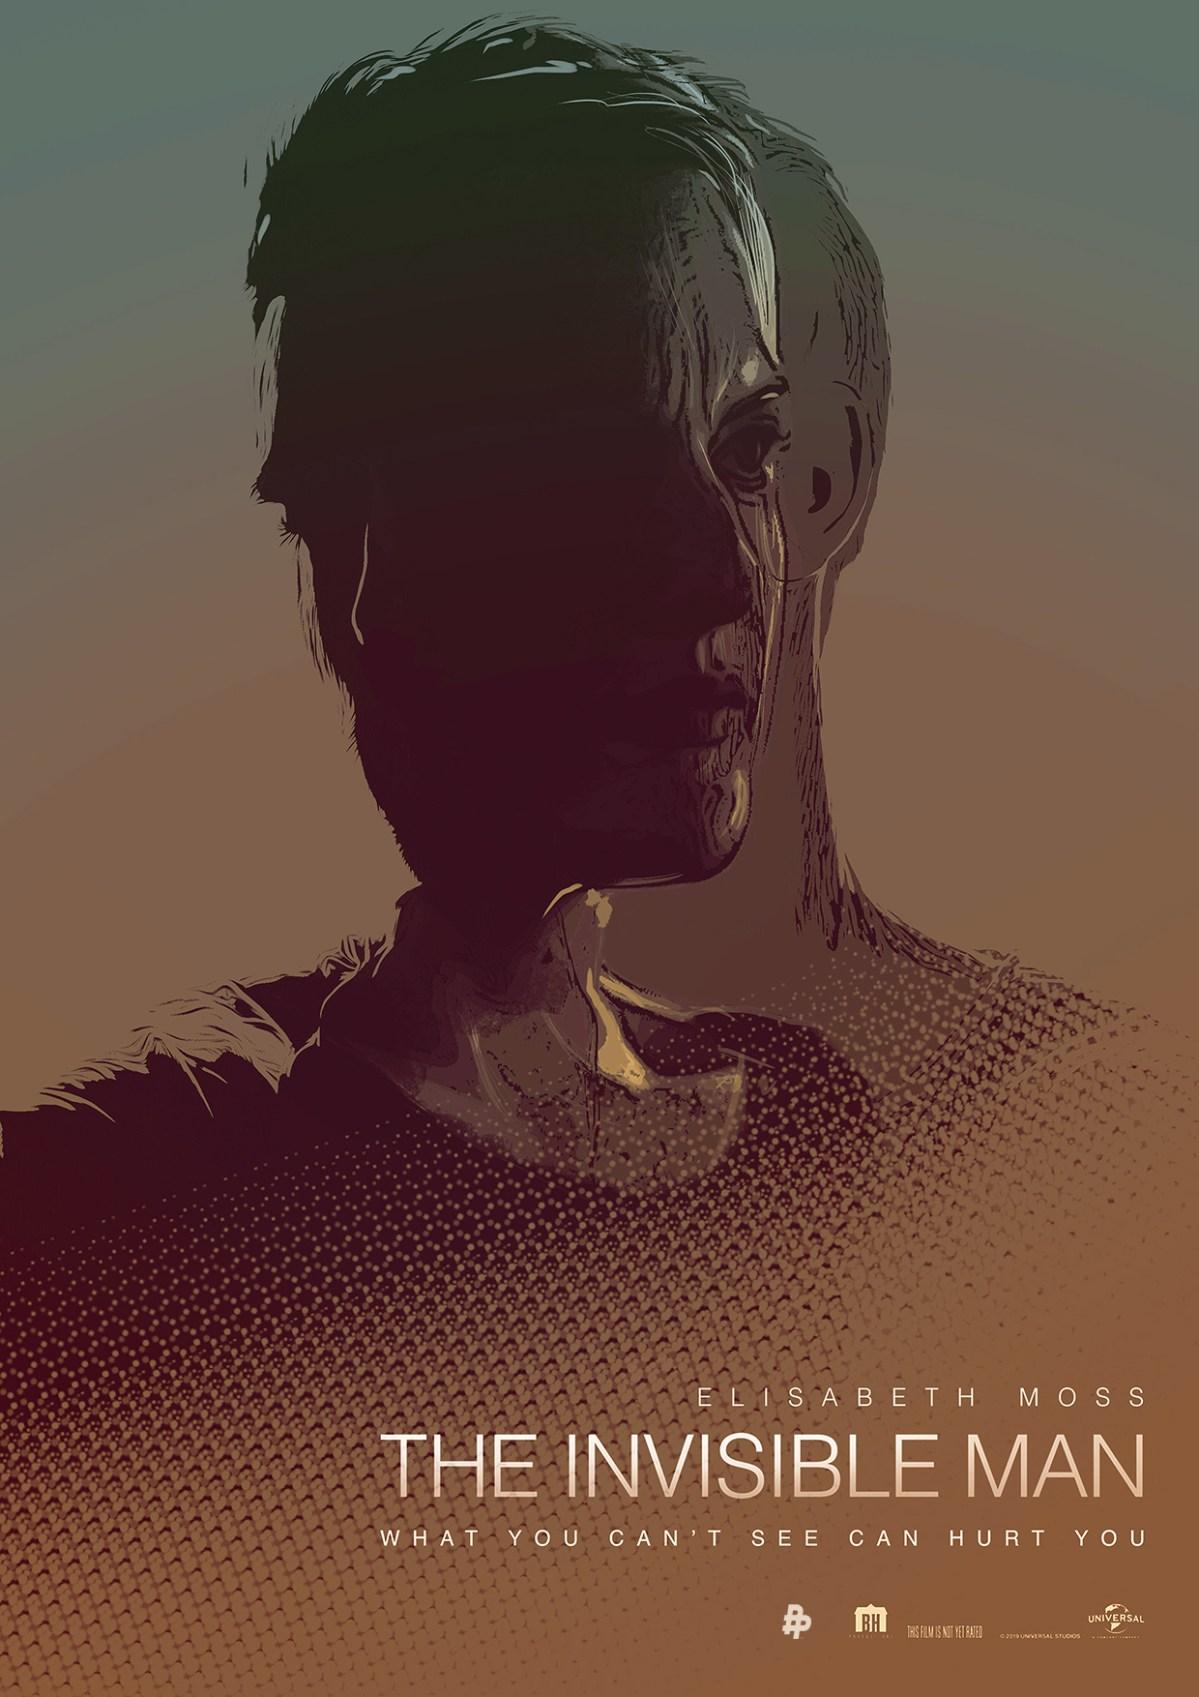 https://i1.wp.com/posterposse.com/wp-content/uploads/2020/02/Invisible-Man-Chris-Malbon-Poster-Posse.jpeg?w=1200